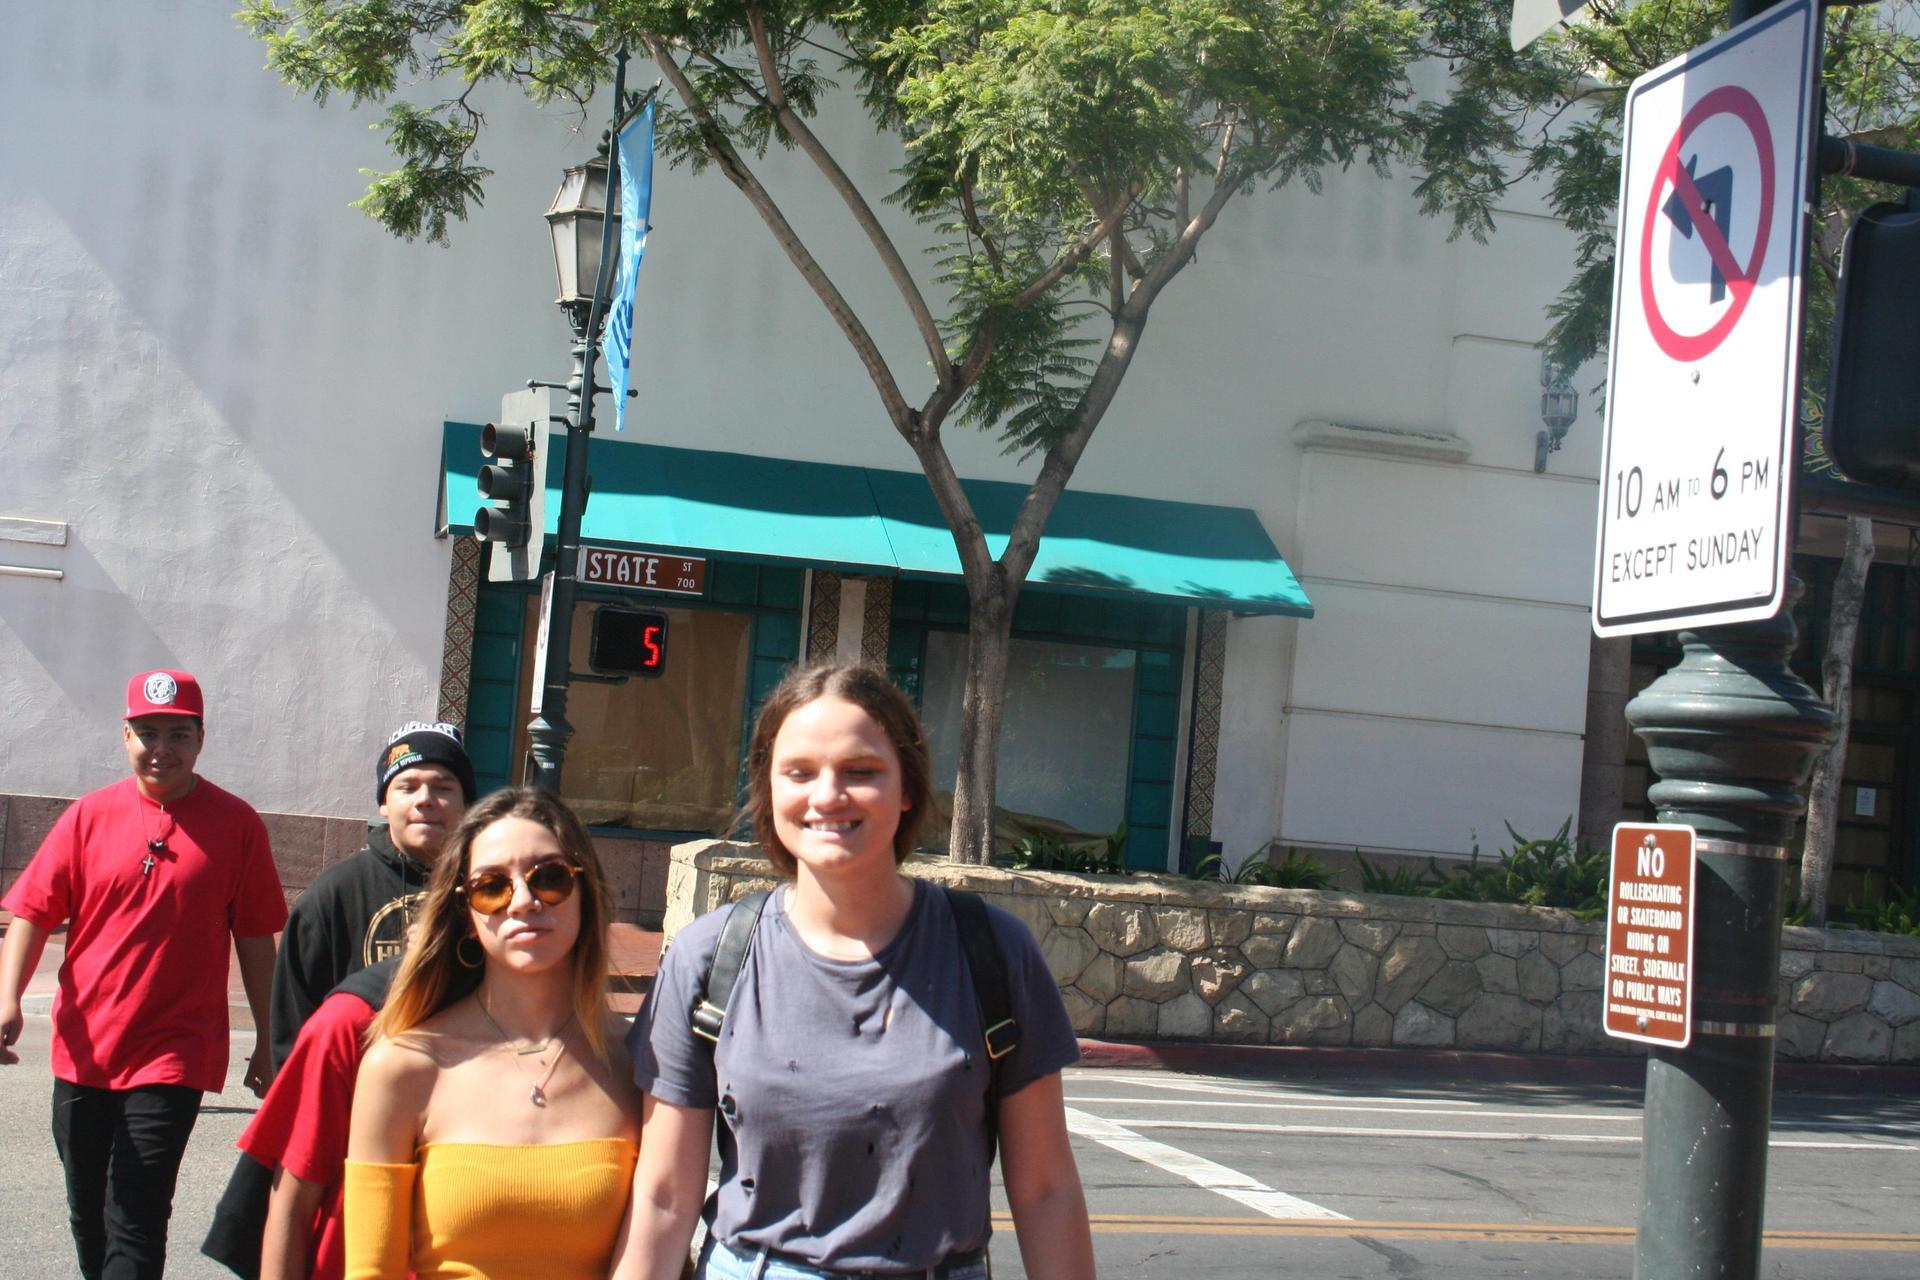 Walking across the street in downtown Santa Barbara